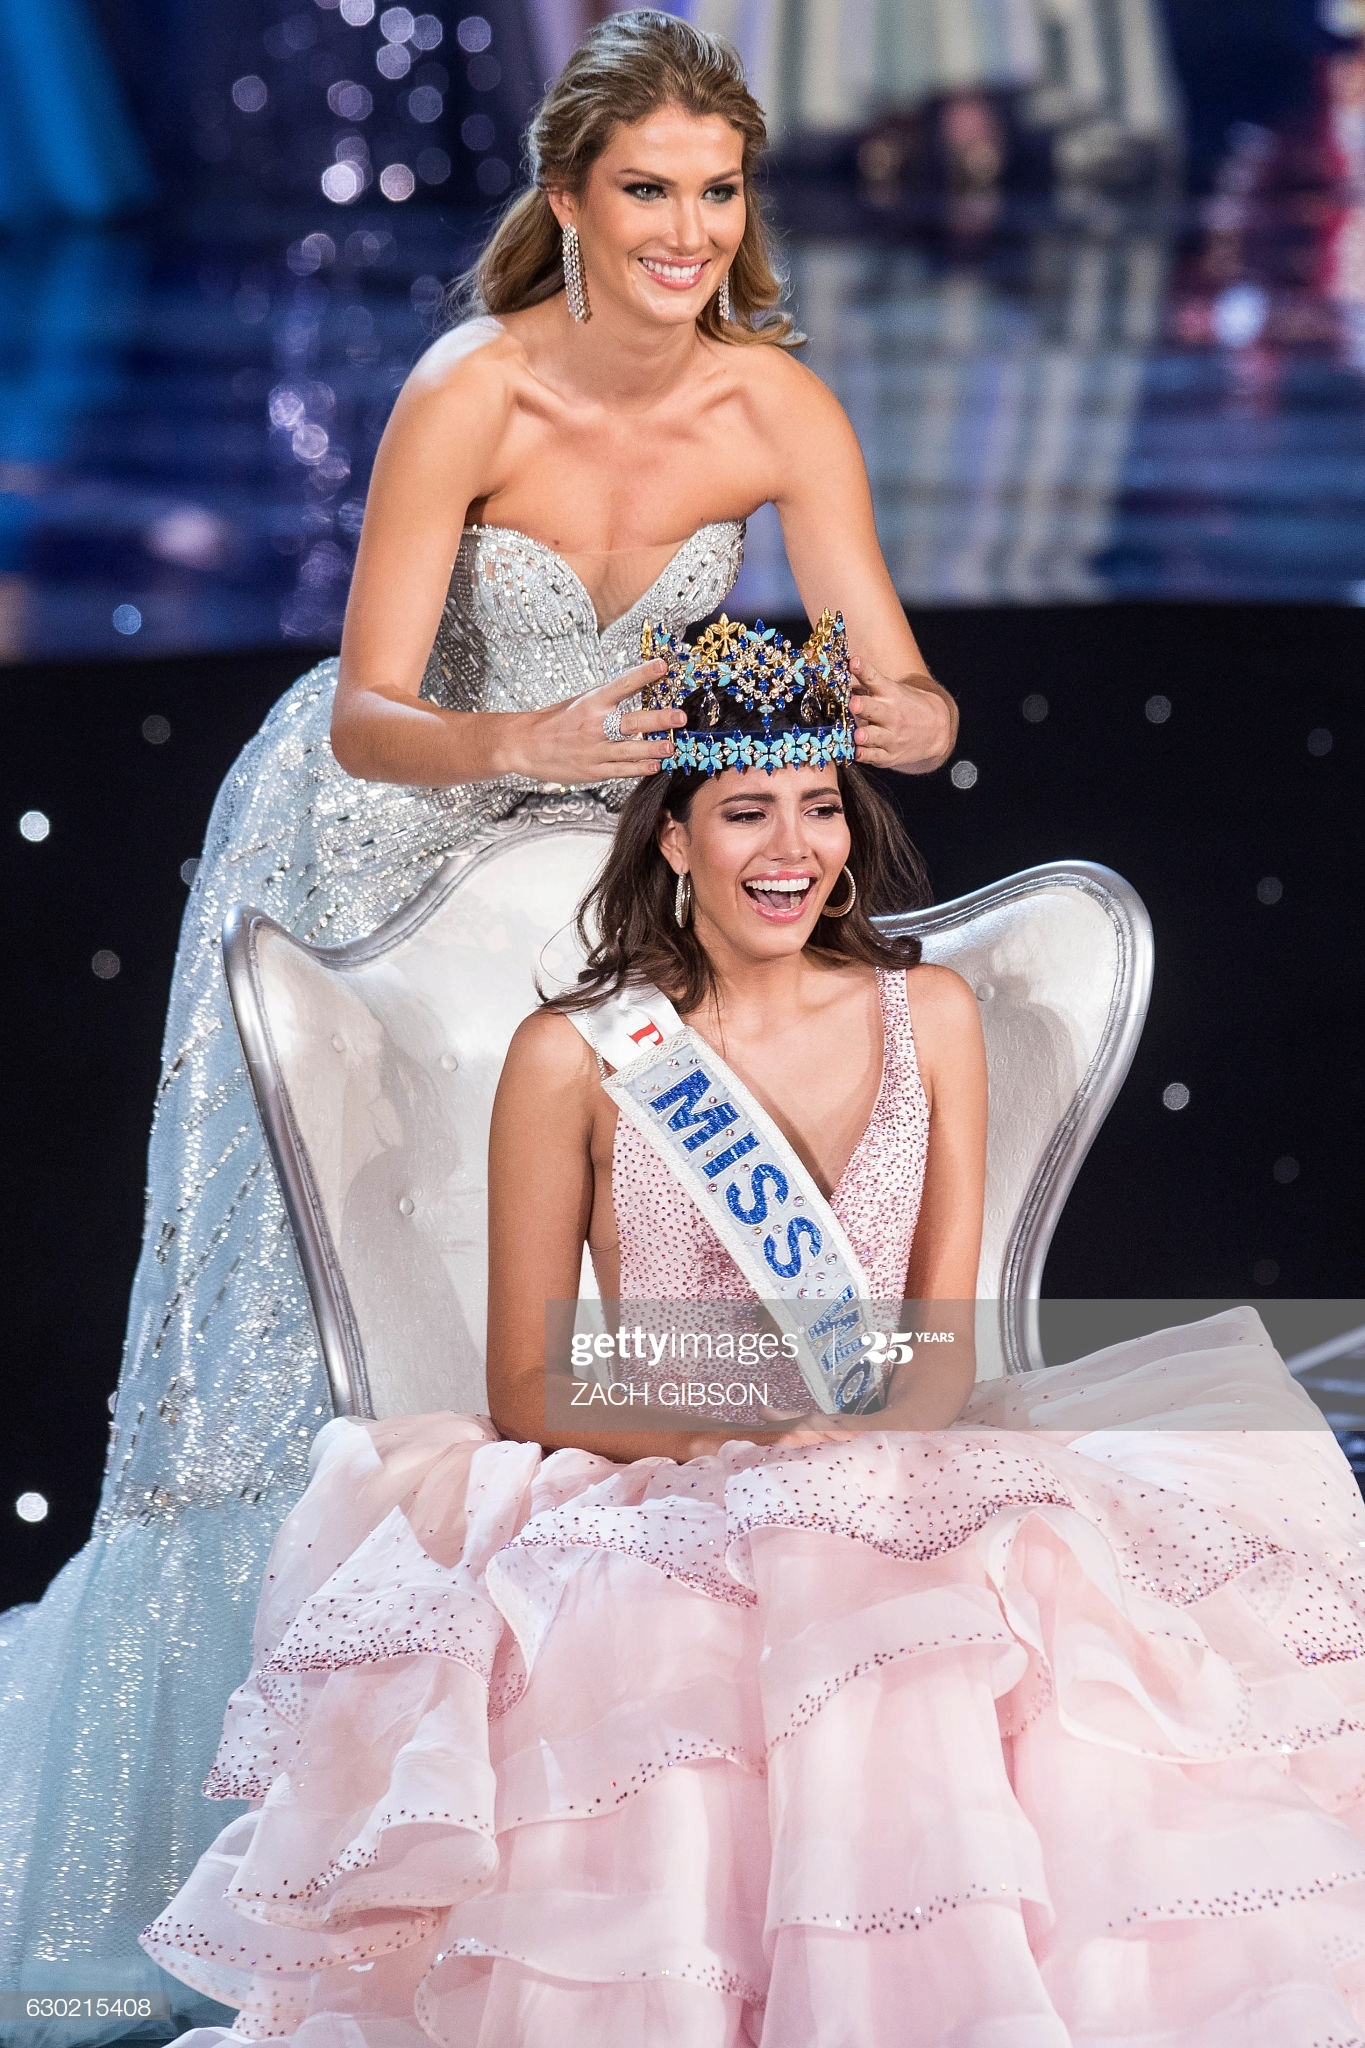 stephanie del valle, miss world 2016. Miss-w75